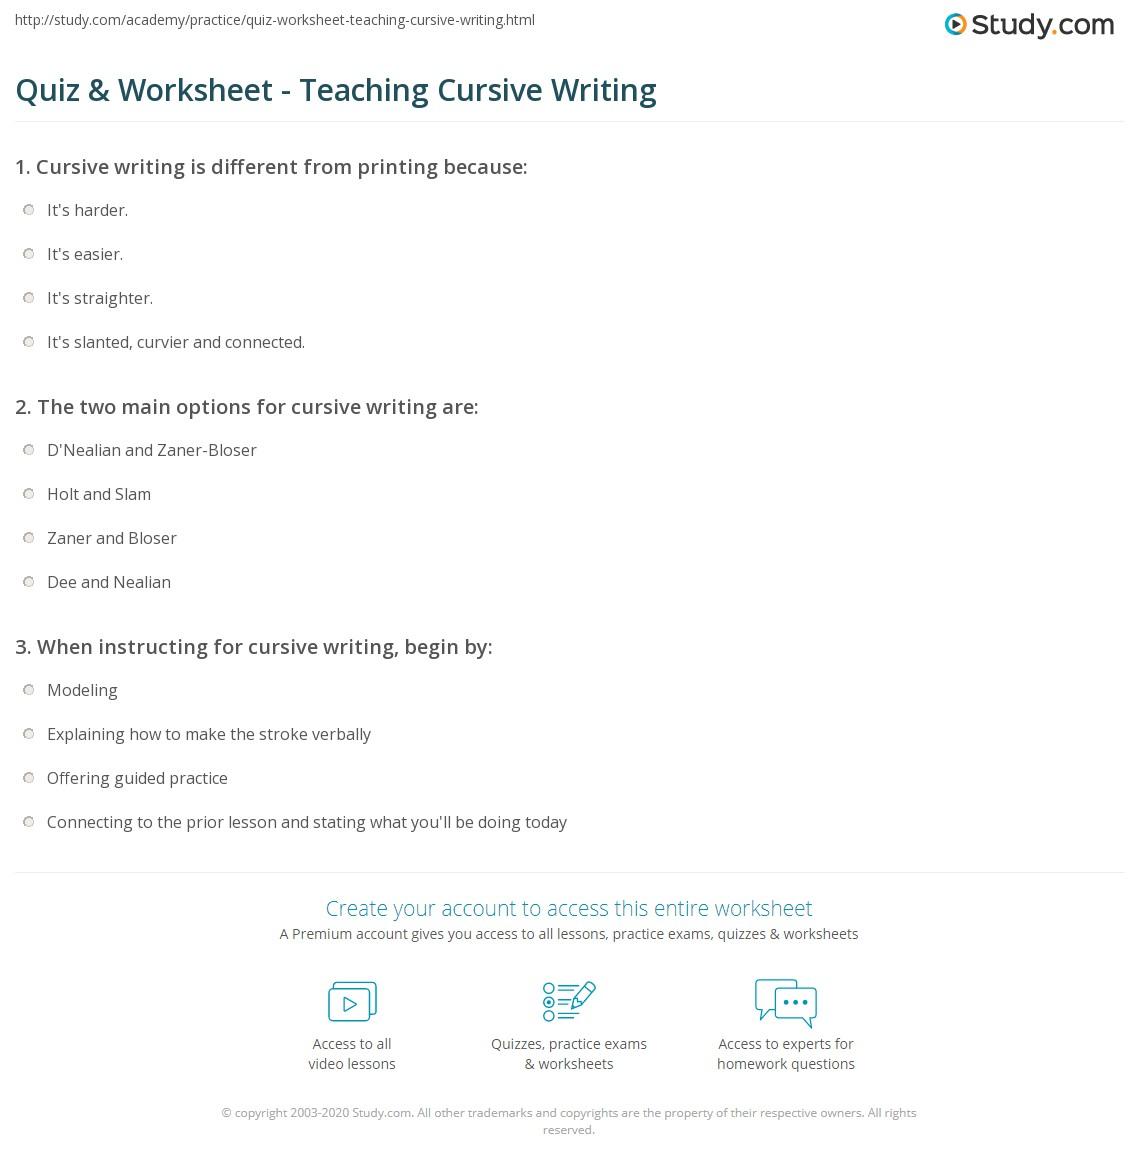 Workbooks zaner bloser cursive worksheets : Quiz & Worksheet - Teaching Cursive Writing | Study.com